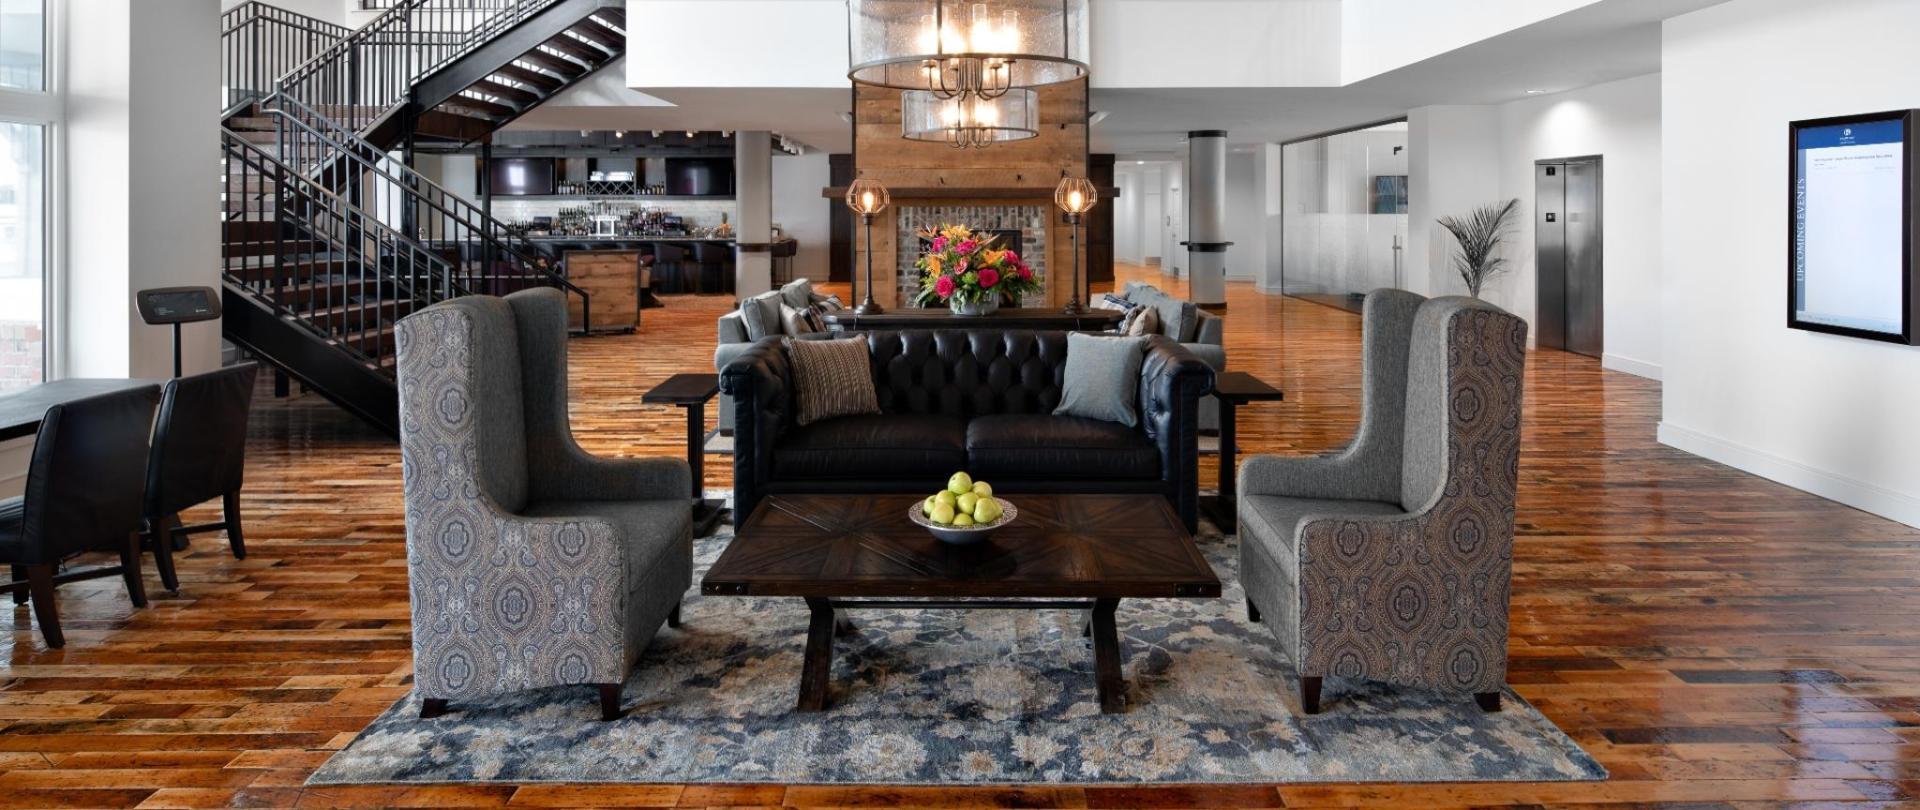 Ascend-Hotels-Lobby-Beaufort-Hotel-NC-1920x810.jpg